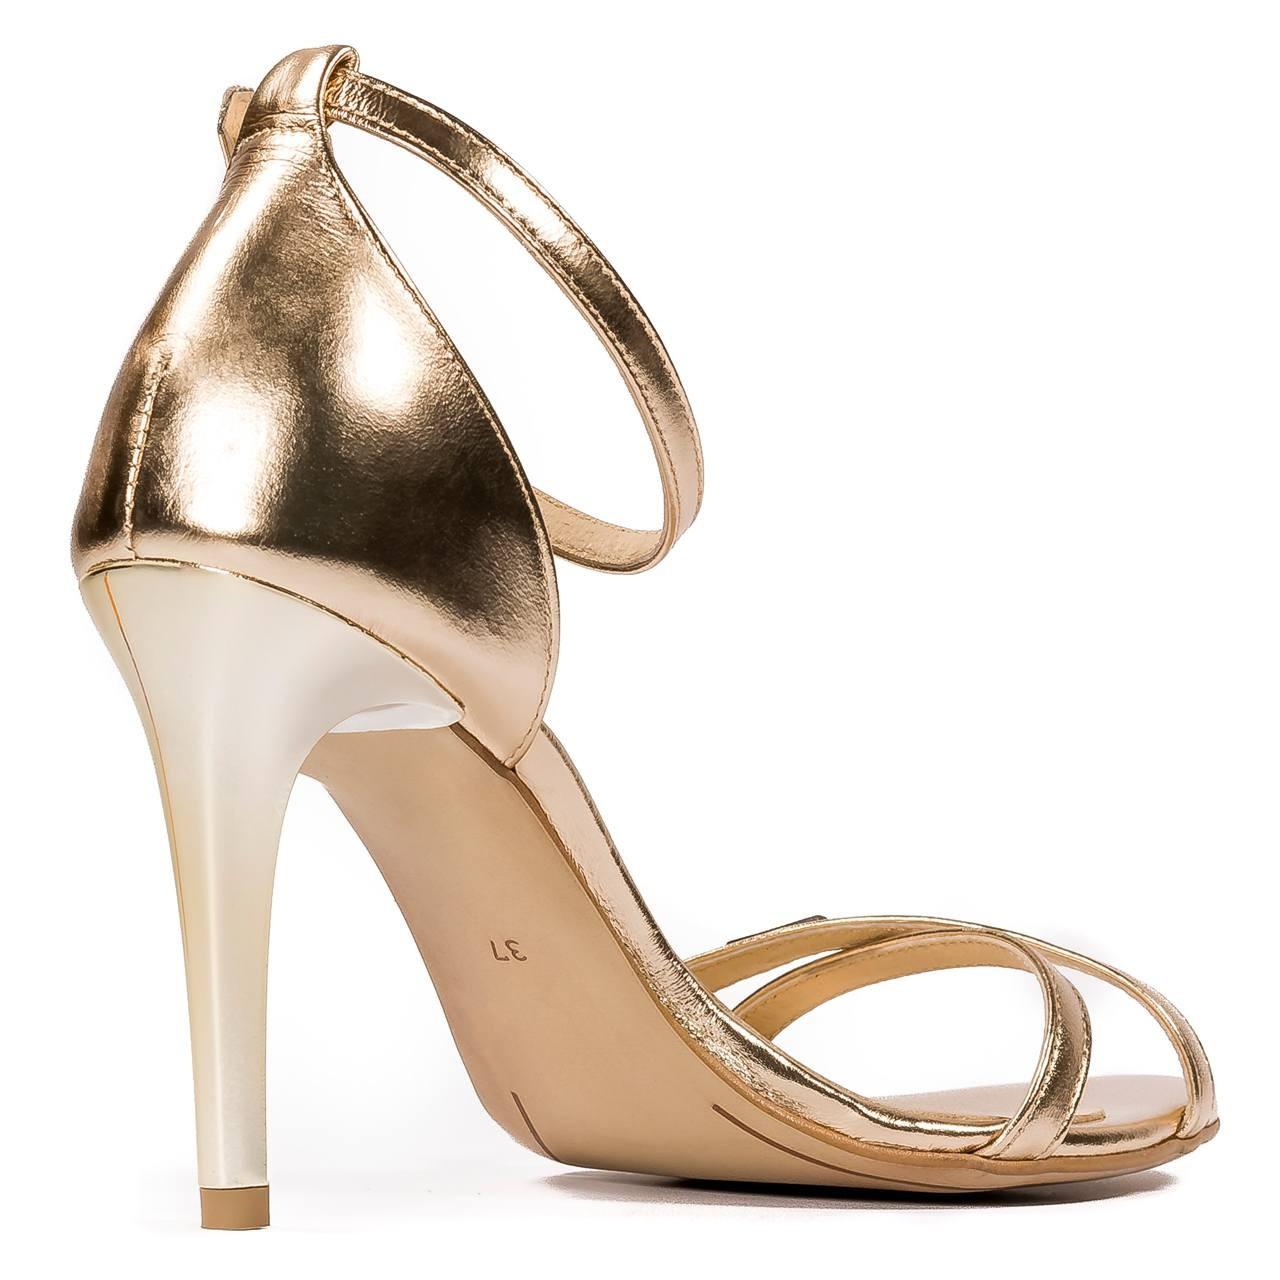 Złote skórzane sandały na obcasie z paskami 04S1 Neścior